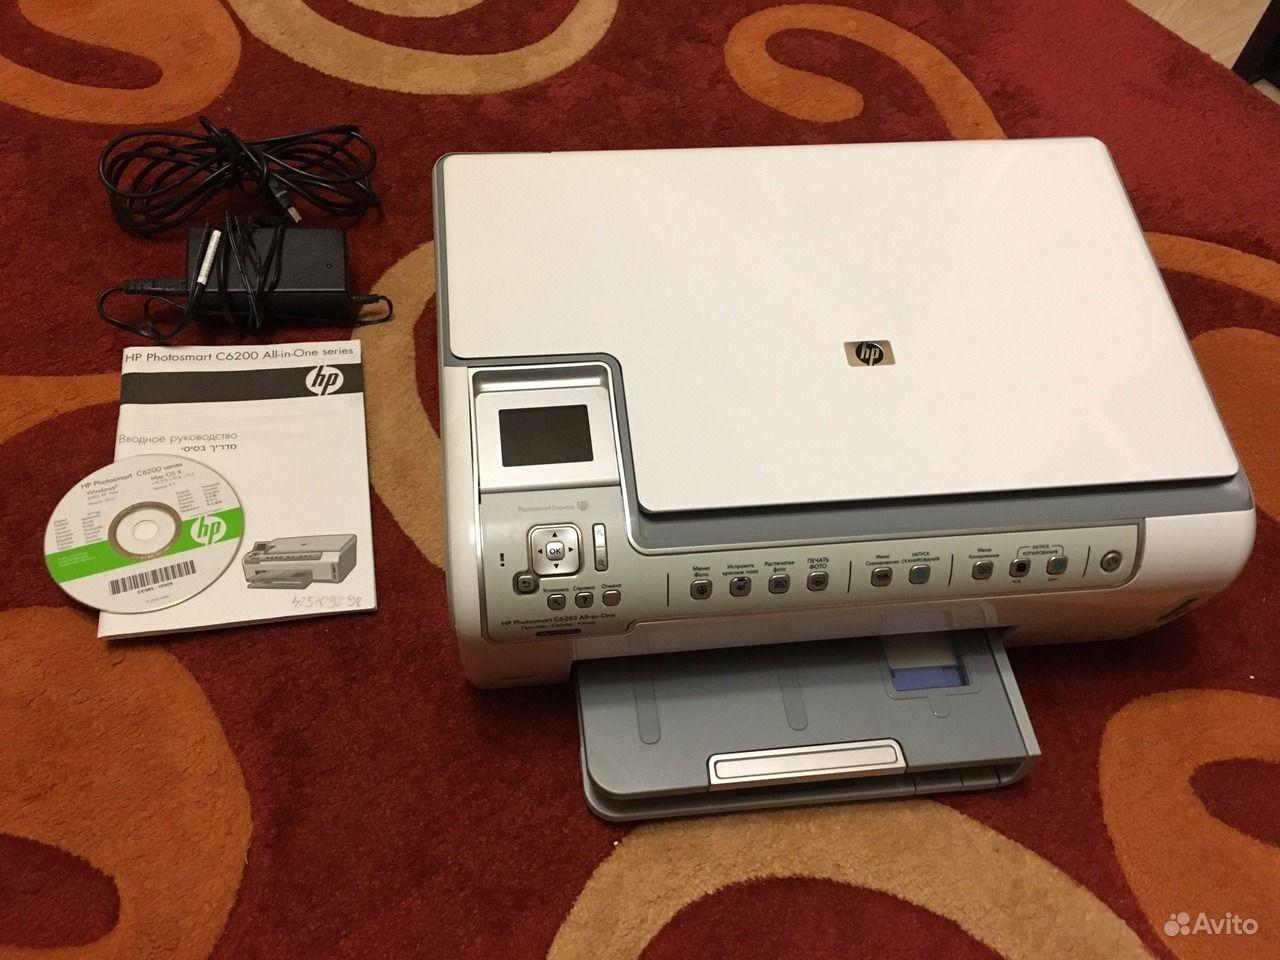 HP PHOTOSMART C6200 SERIES TREIBER WINDOWS 8